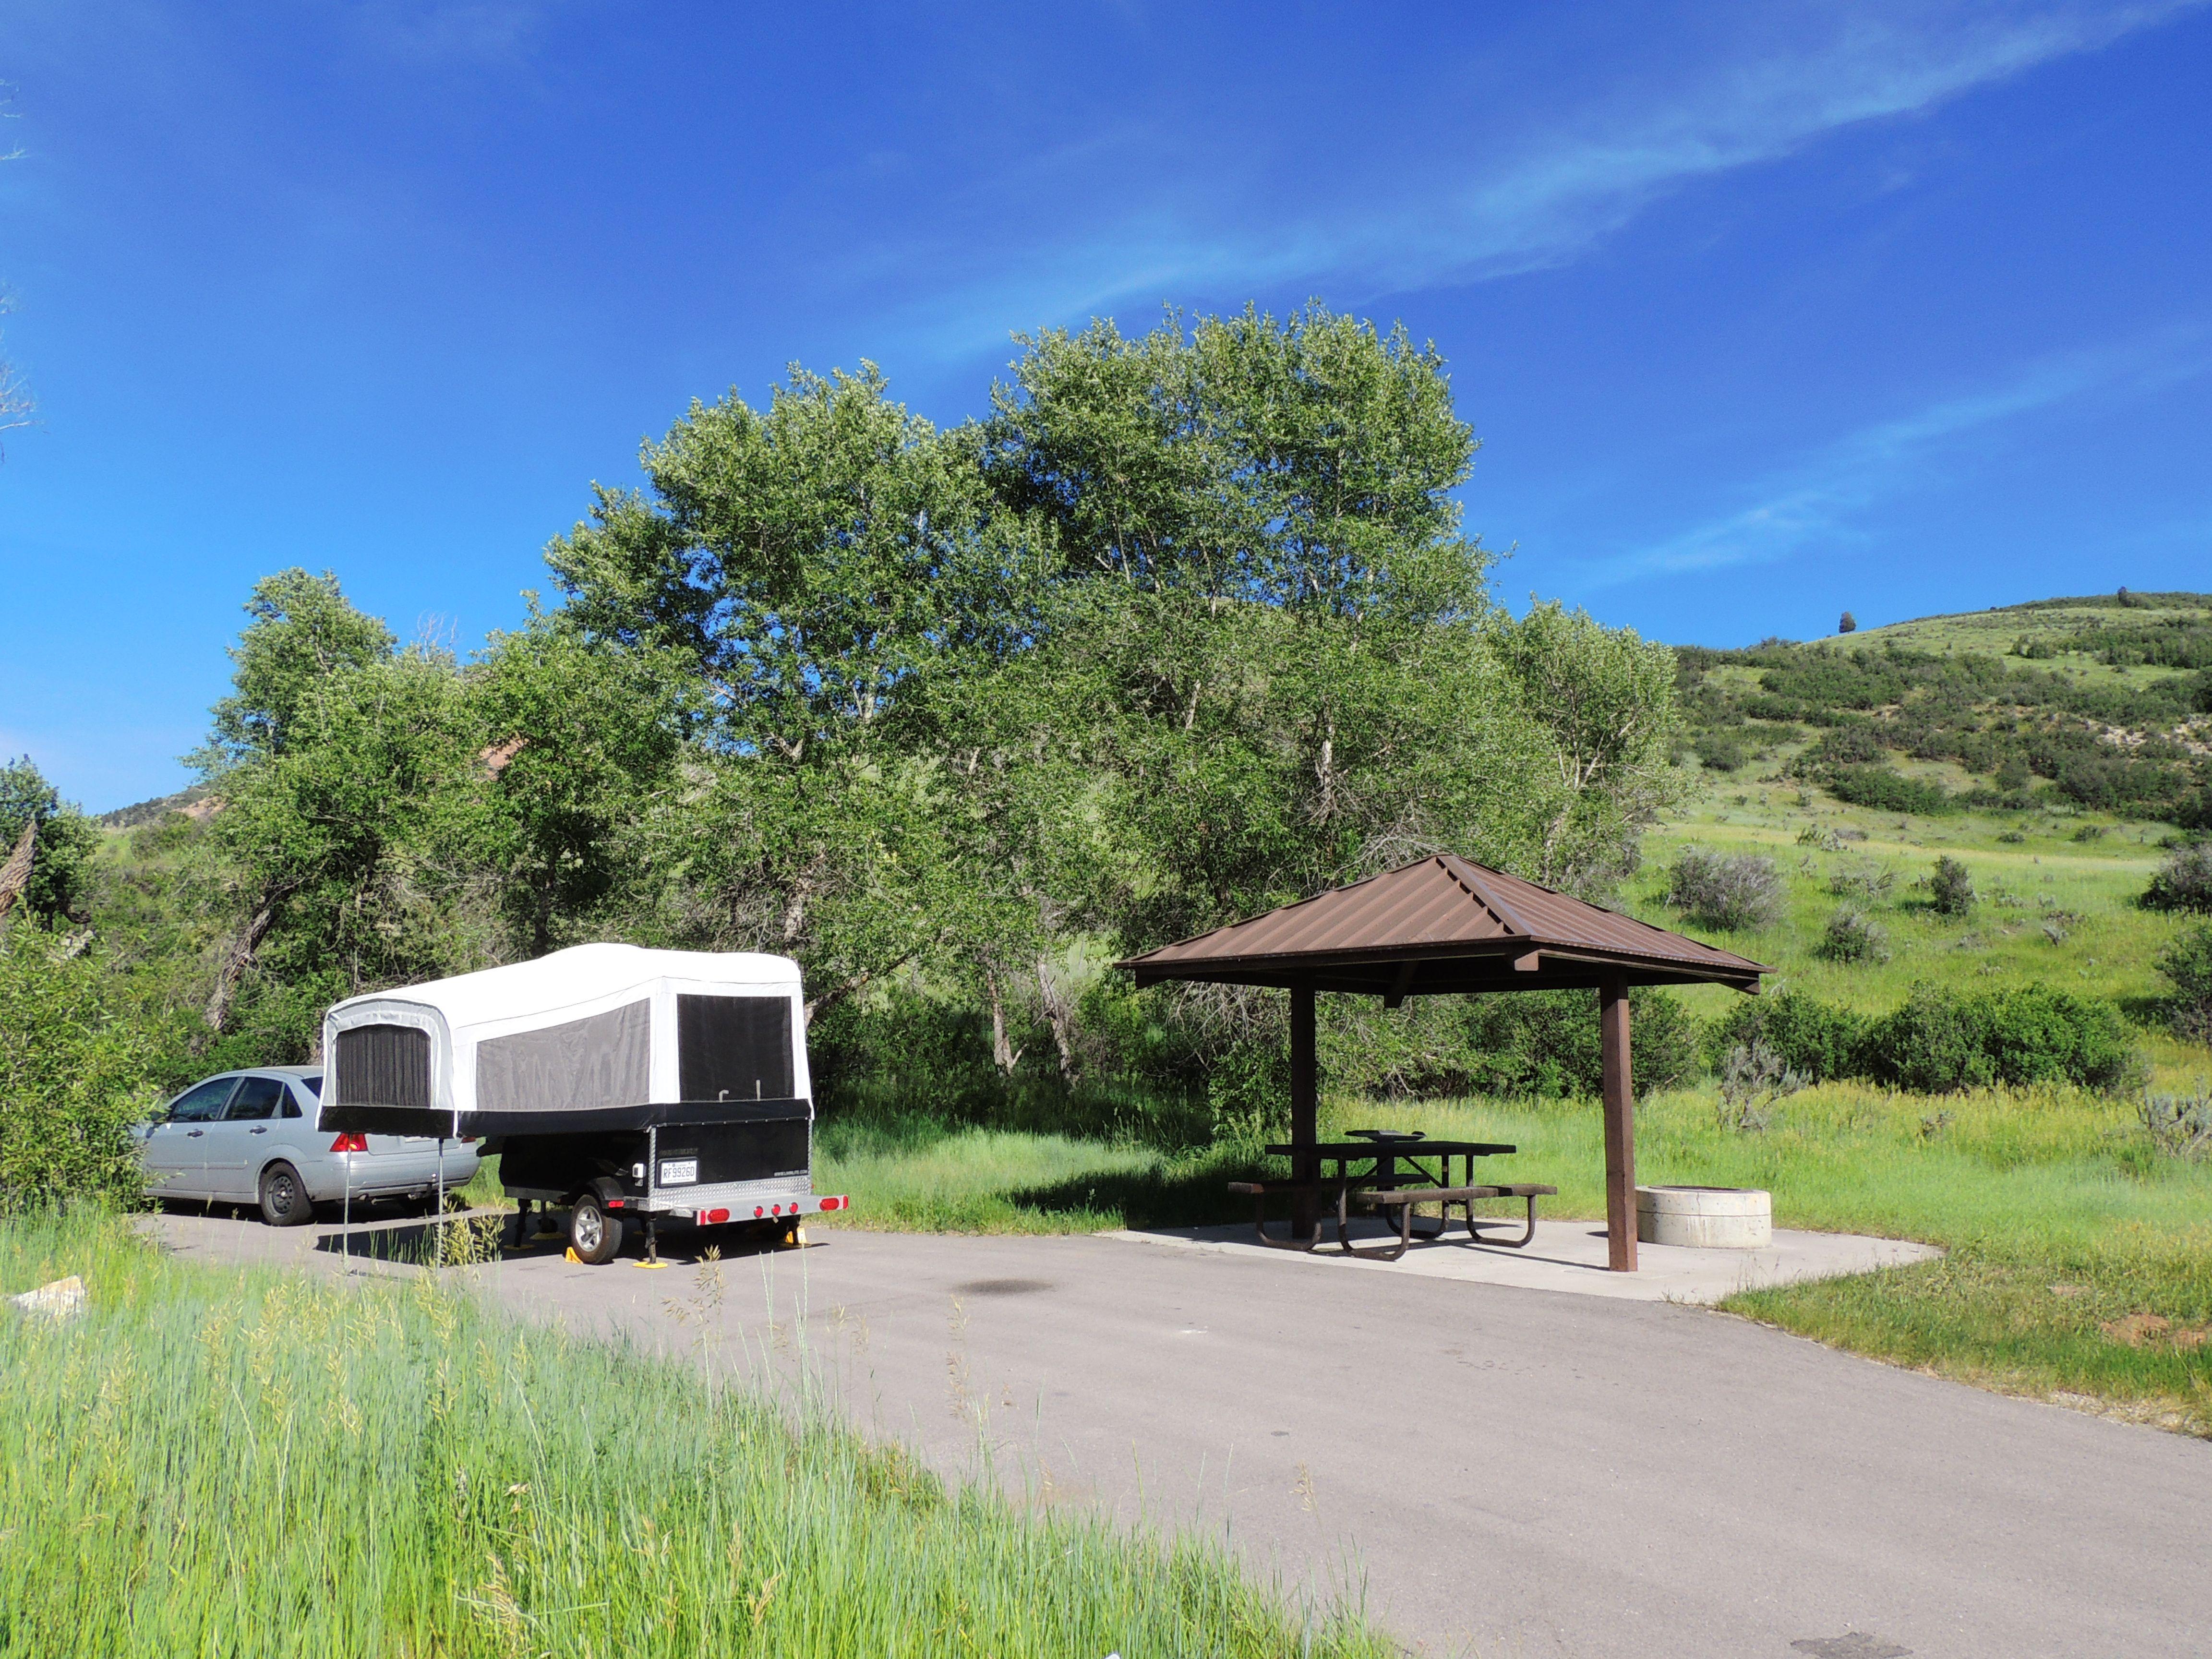 Diamond campground terrain b053, Springville, Utah (2015)